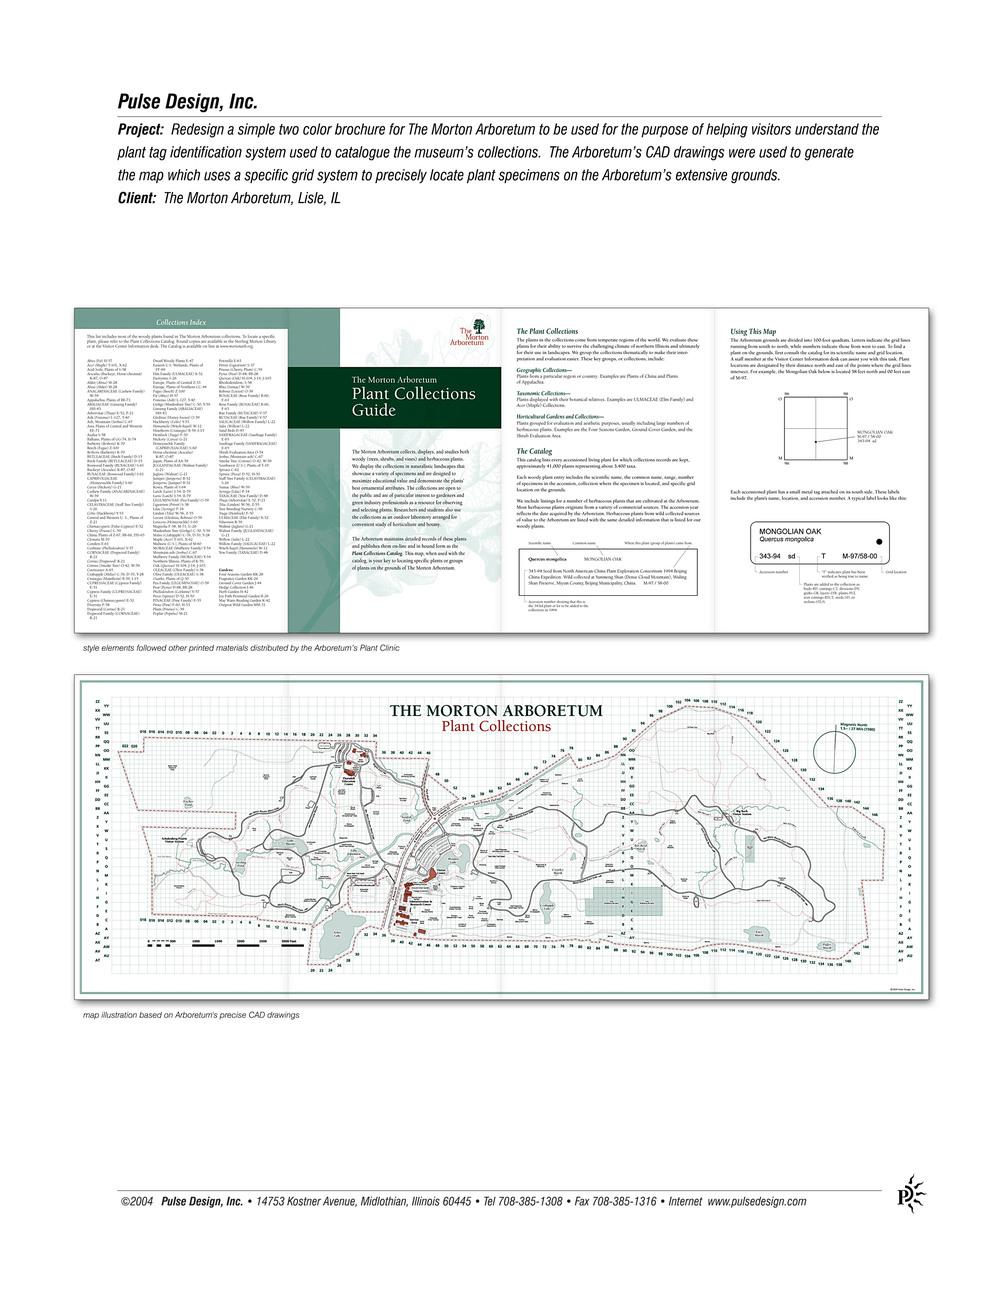 Morton-Arboretum-Brochure-Collections-Map-Pulse-Design-Inc.jpg